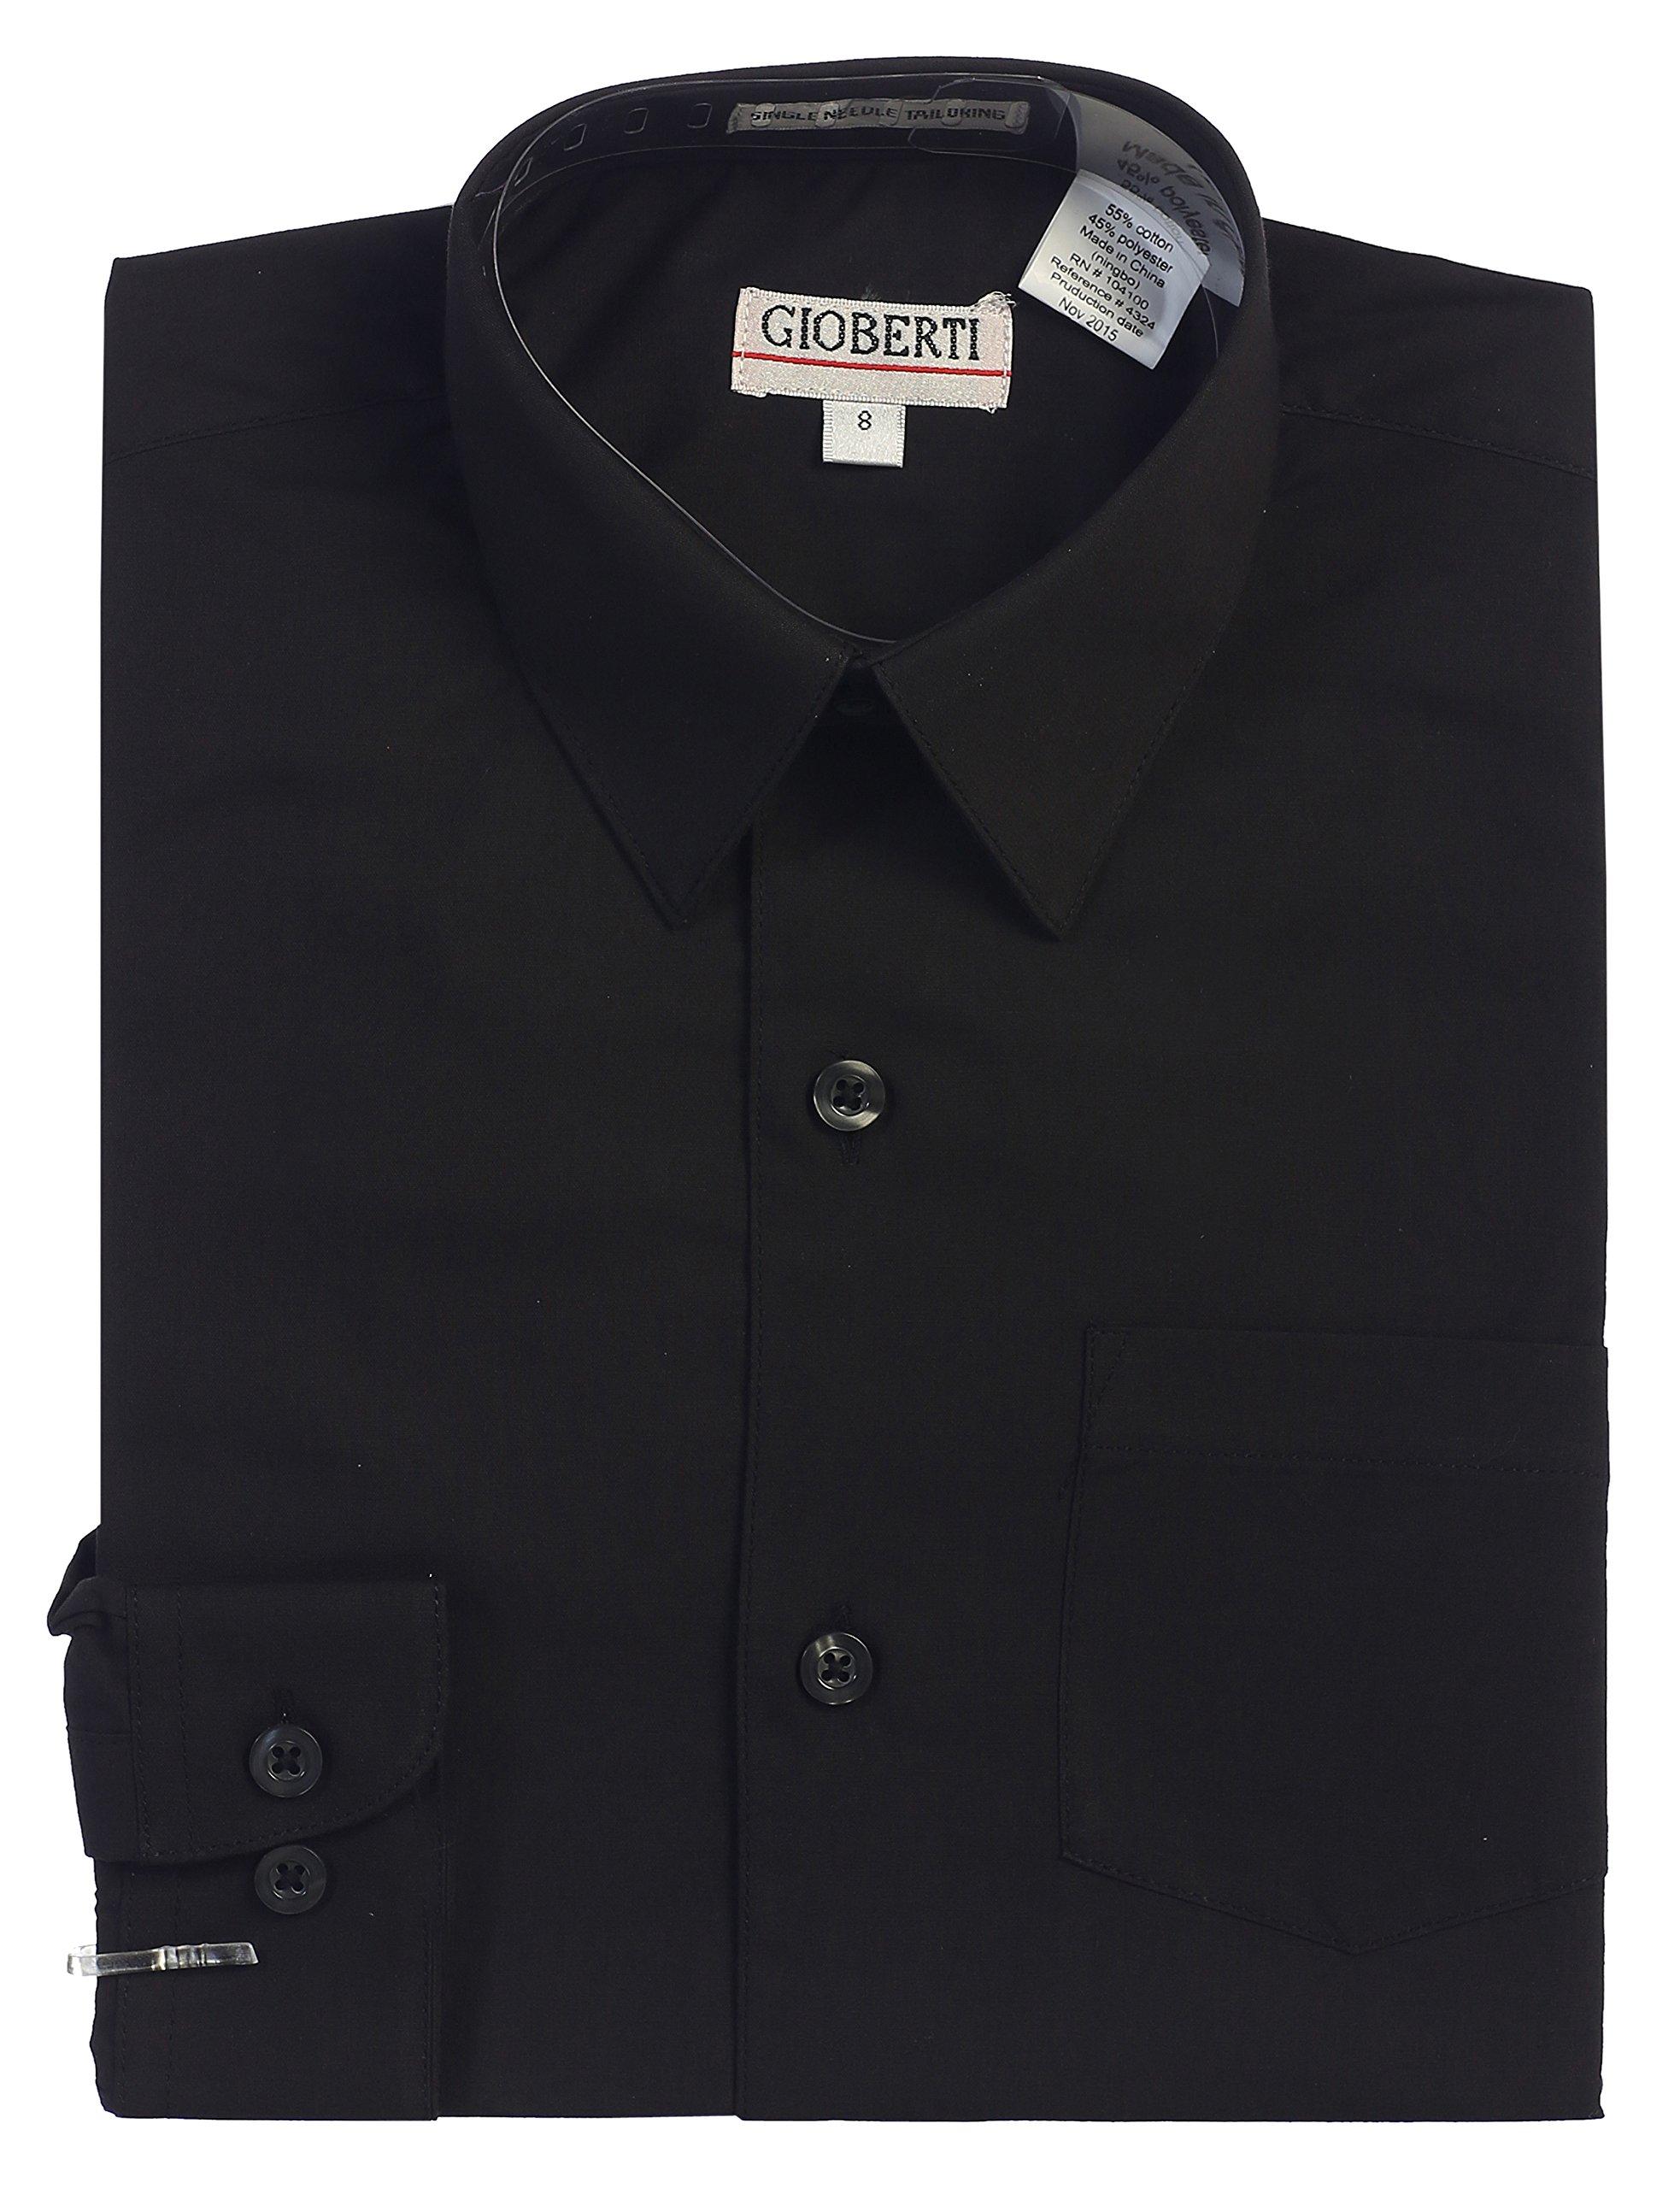 Gioberti Big Boys' Long Sleeve Dress Shirt, Black, 12